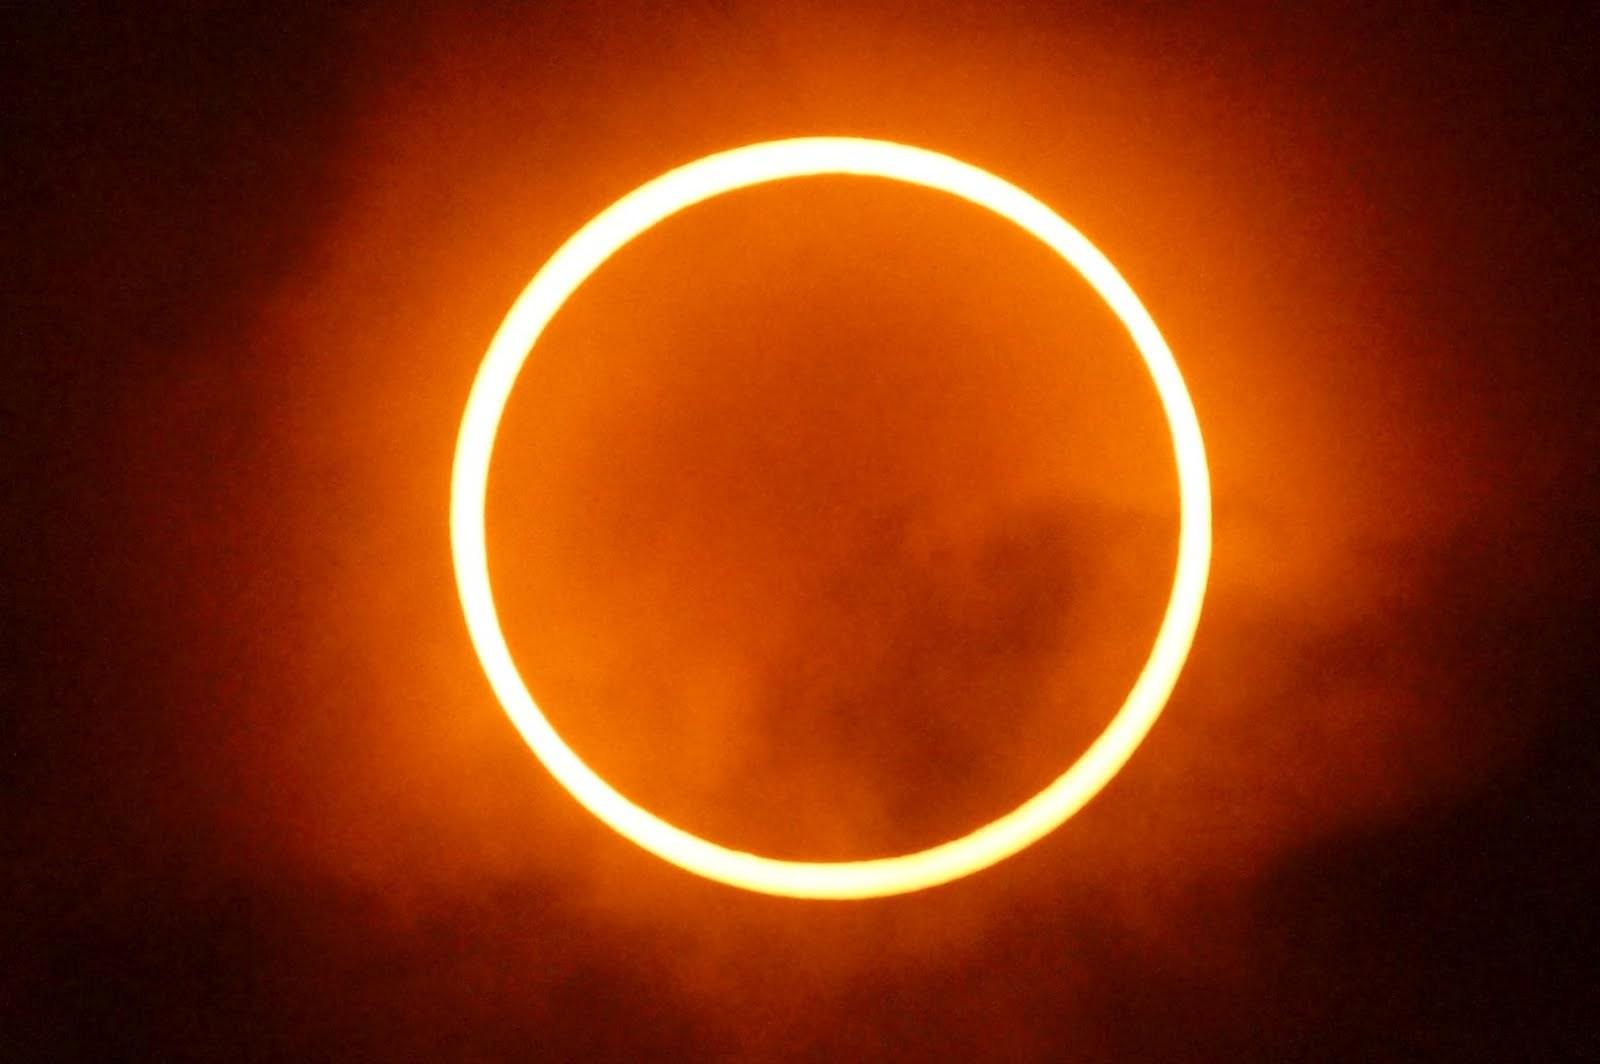 Efek Gerhana Matahari Pada Harga Besi Beton